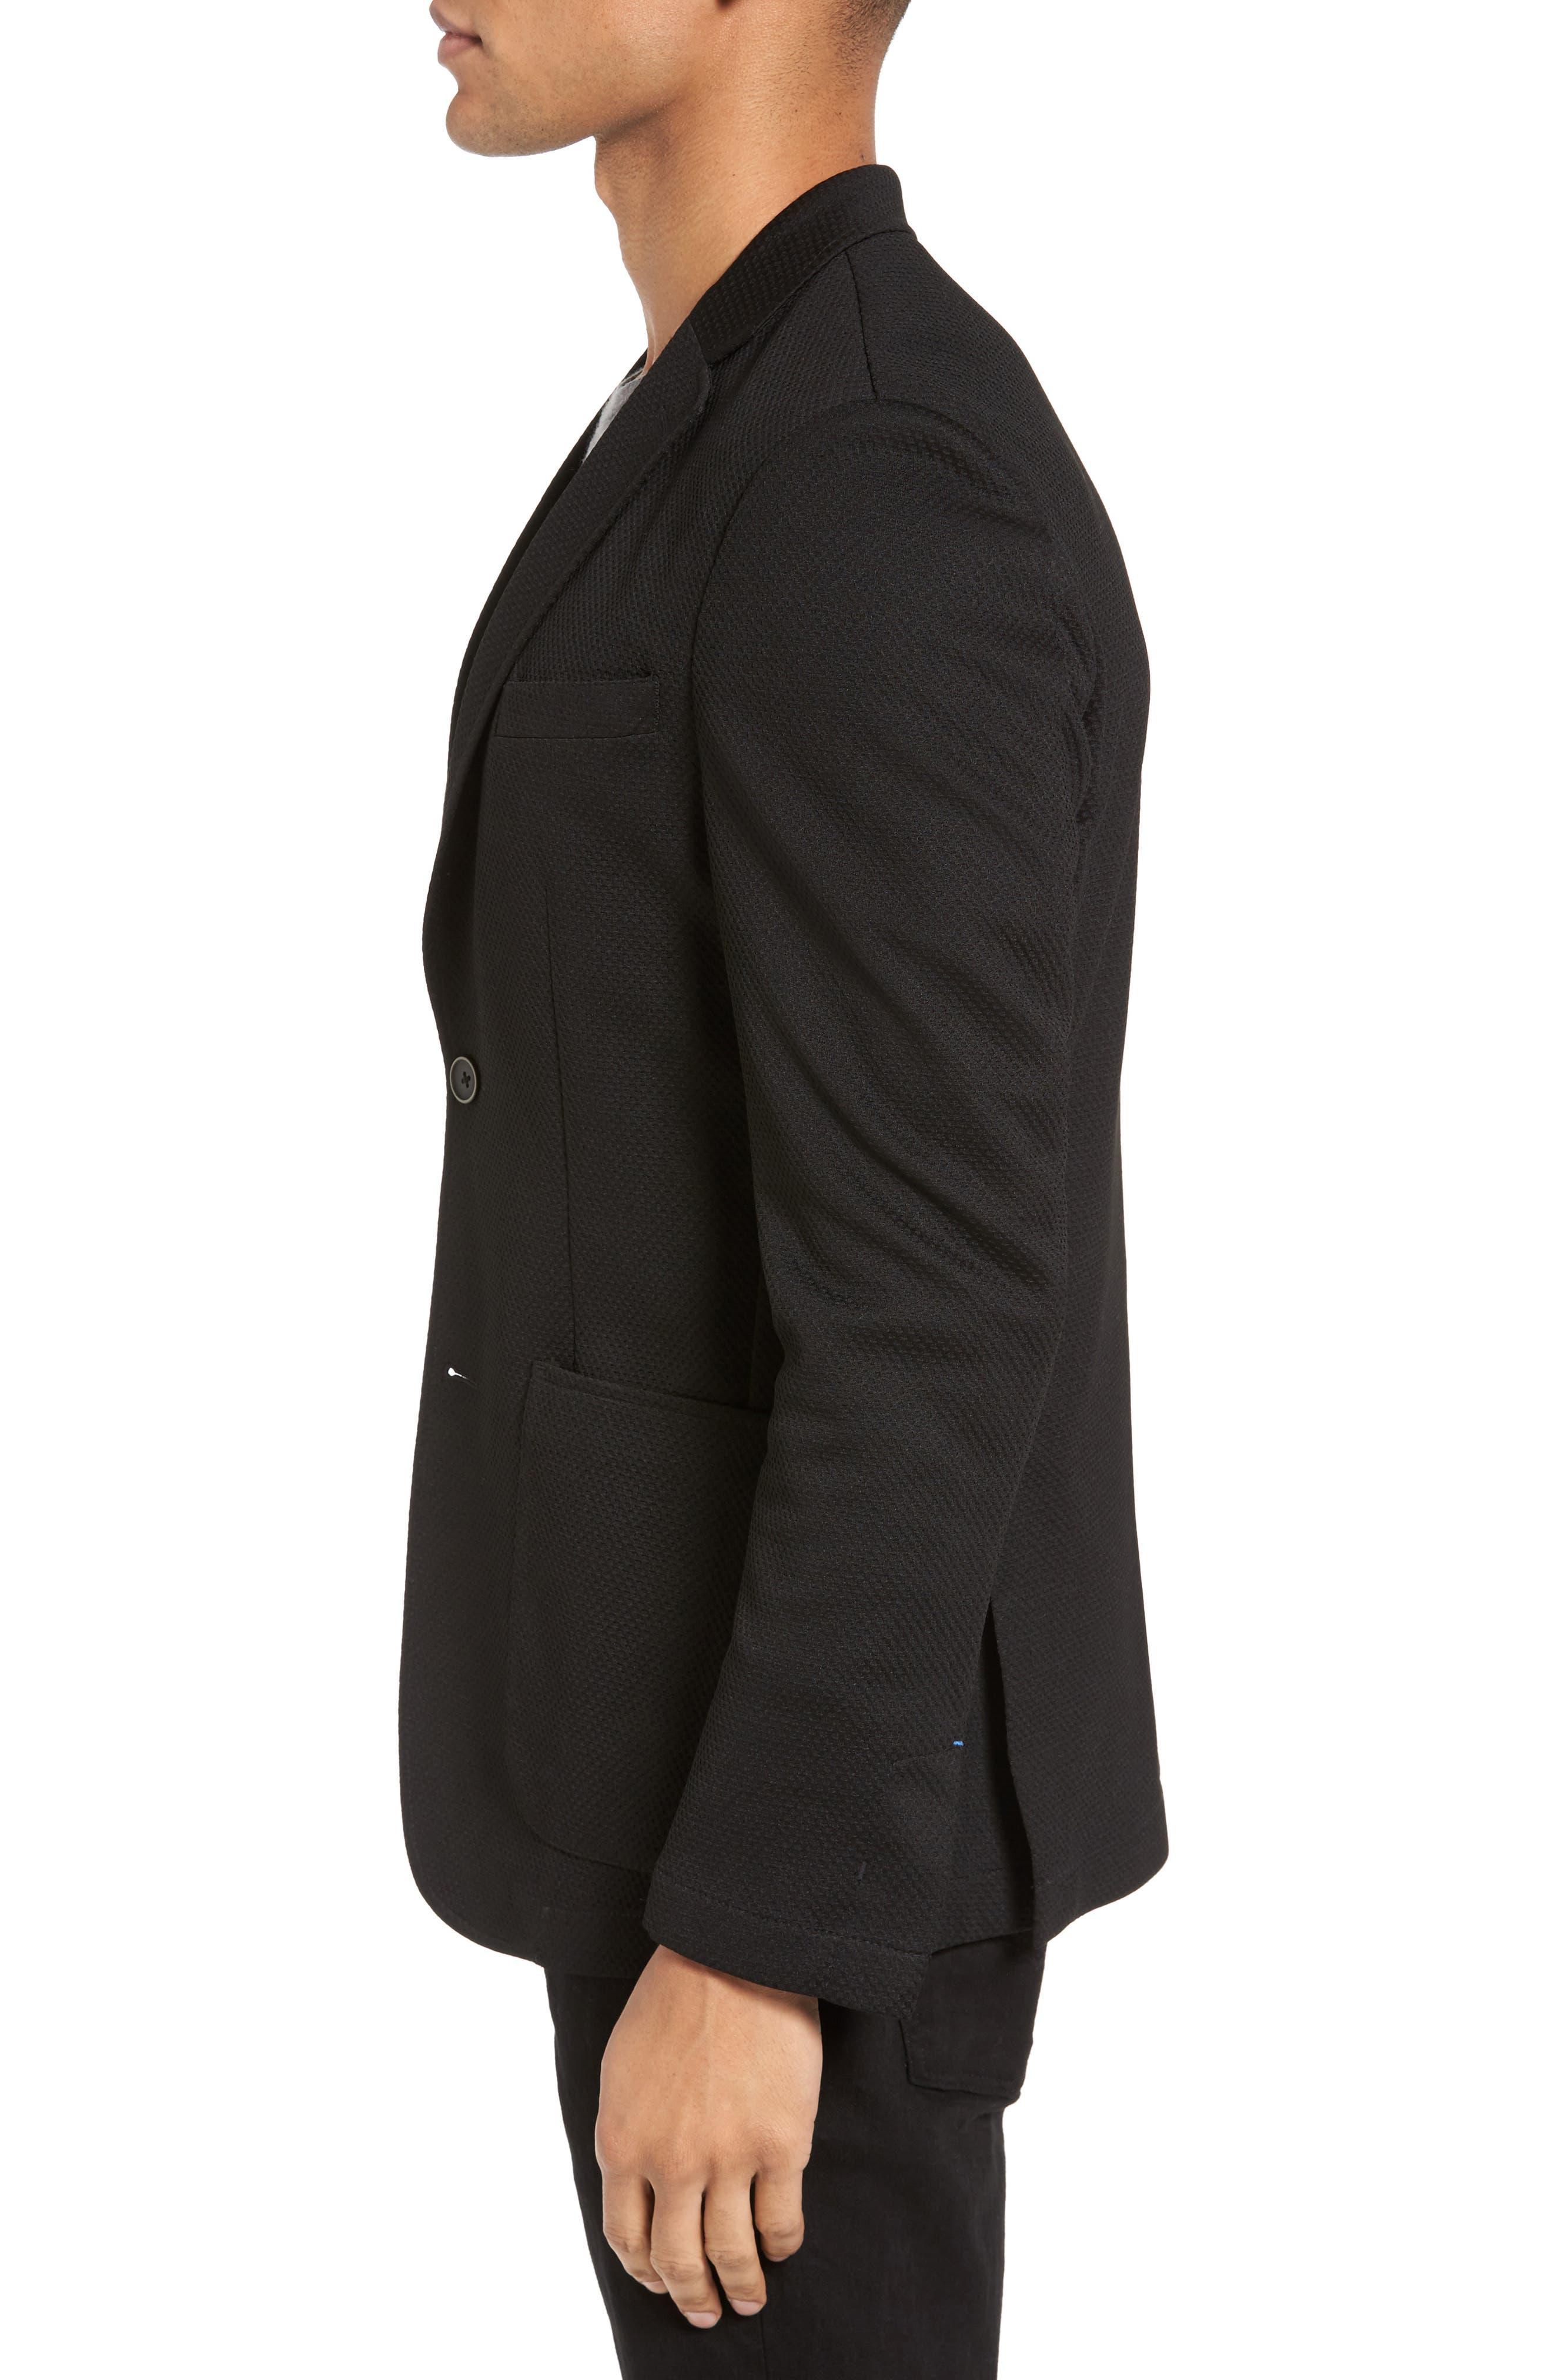 VINCE CAMUTO, Slim Fit Stretch Knit Sport Coat, Alternate thumbnail 4, color, BLACK